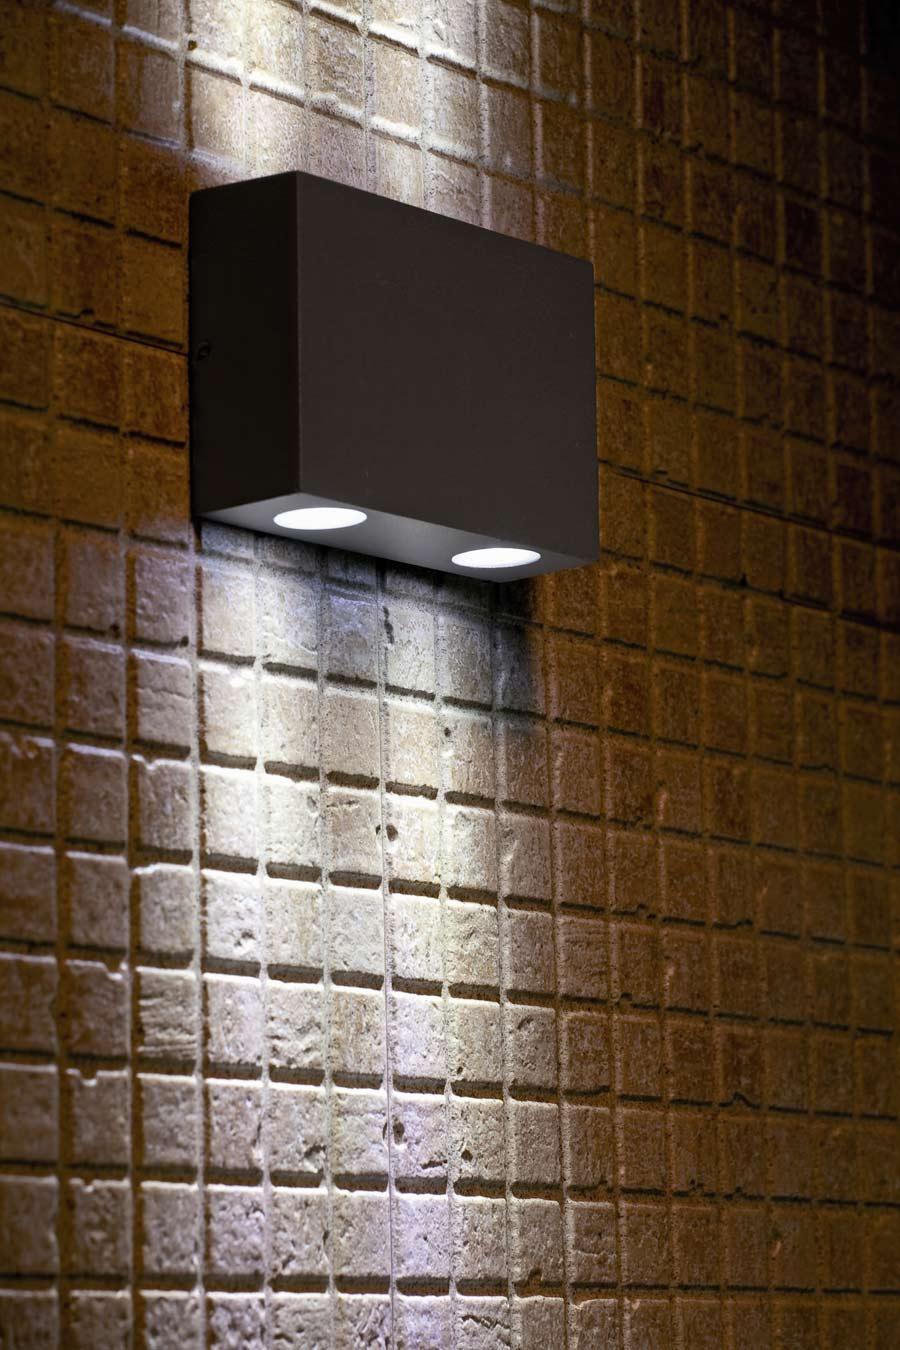 Marat 2 applique extérieur LED miniature aluminium gris | Faro ...